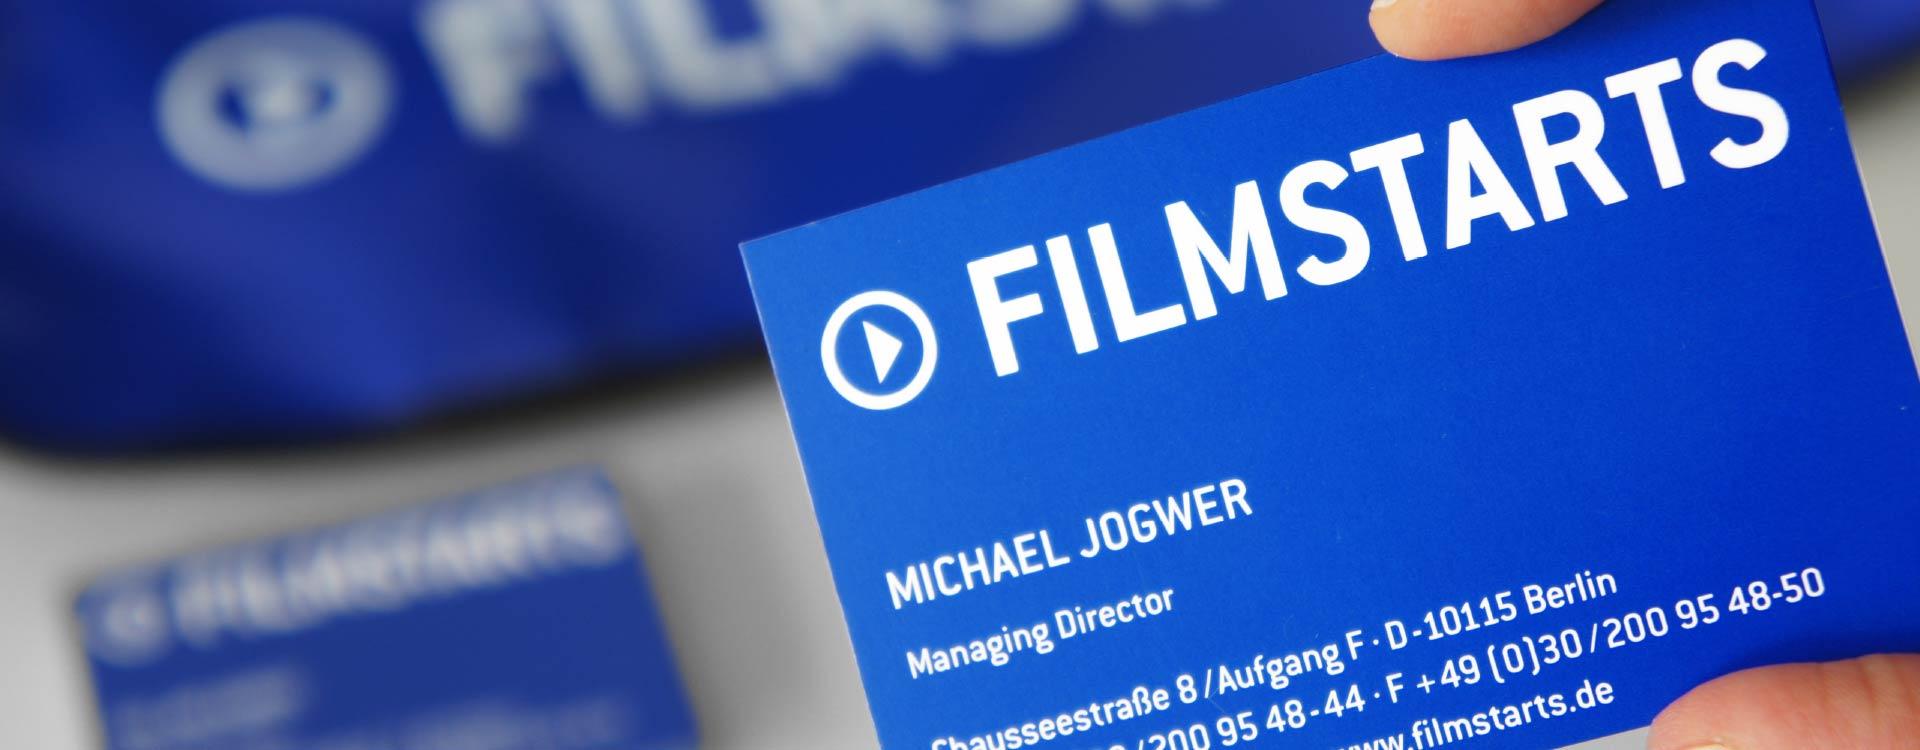 Visitenkarte Filmstarts